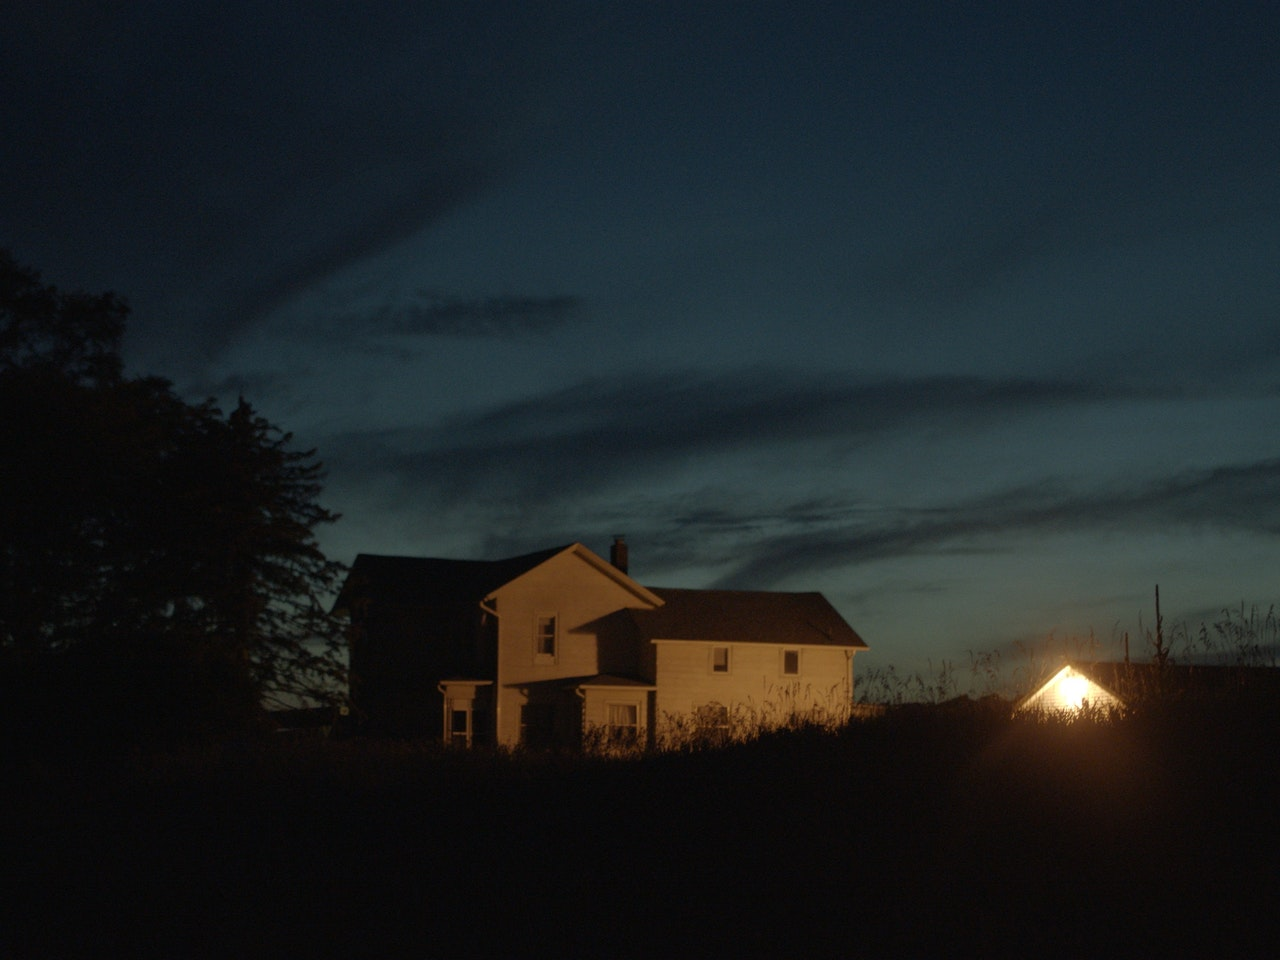 farmhouse1_1.15.2